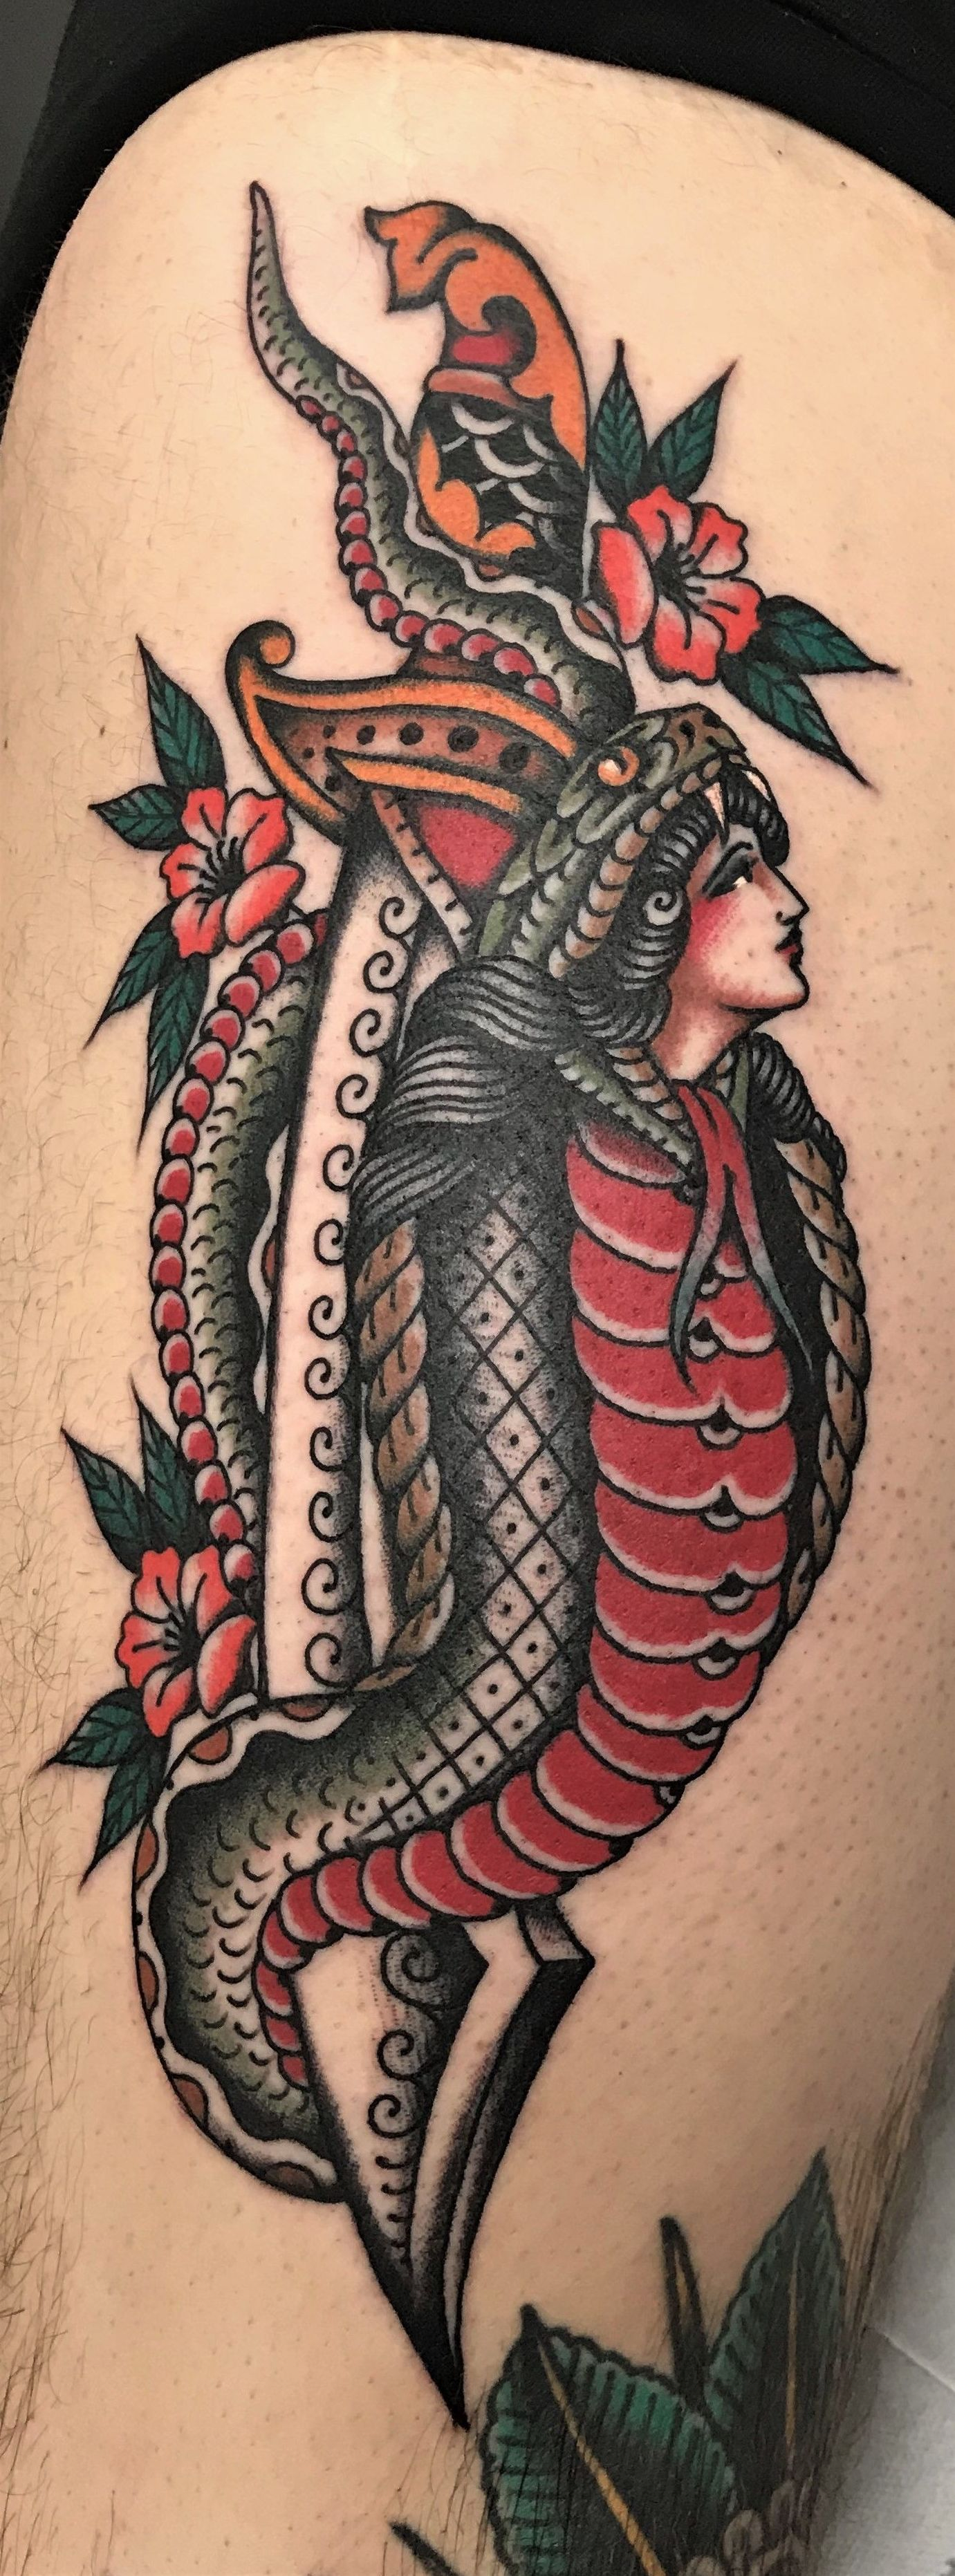 Foto 1 de Tatuajes en Madrid | True Love Tattoo